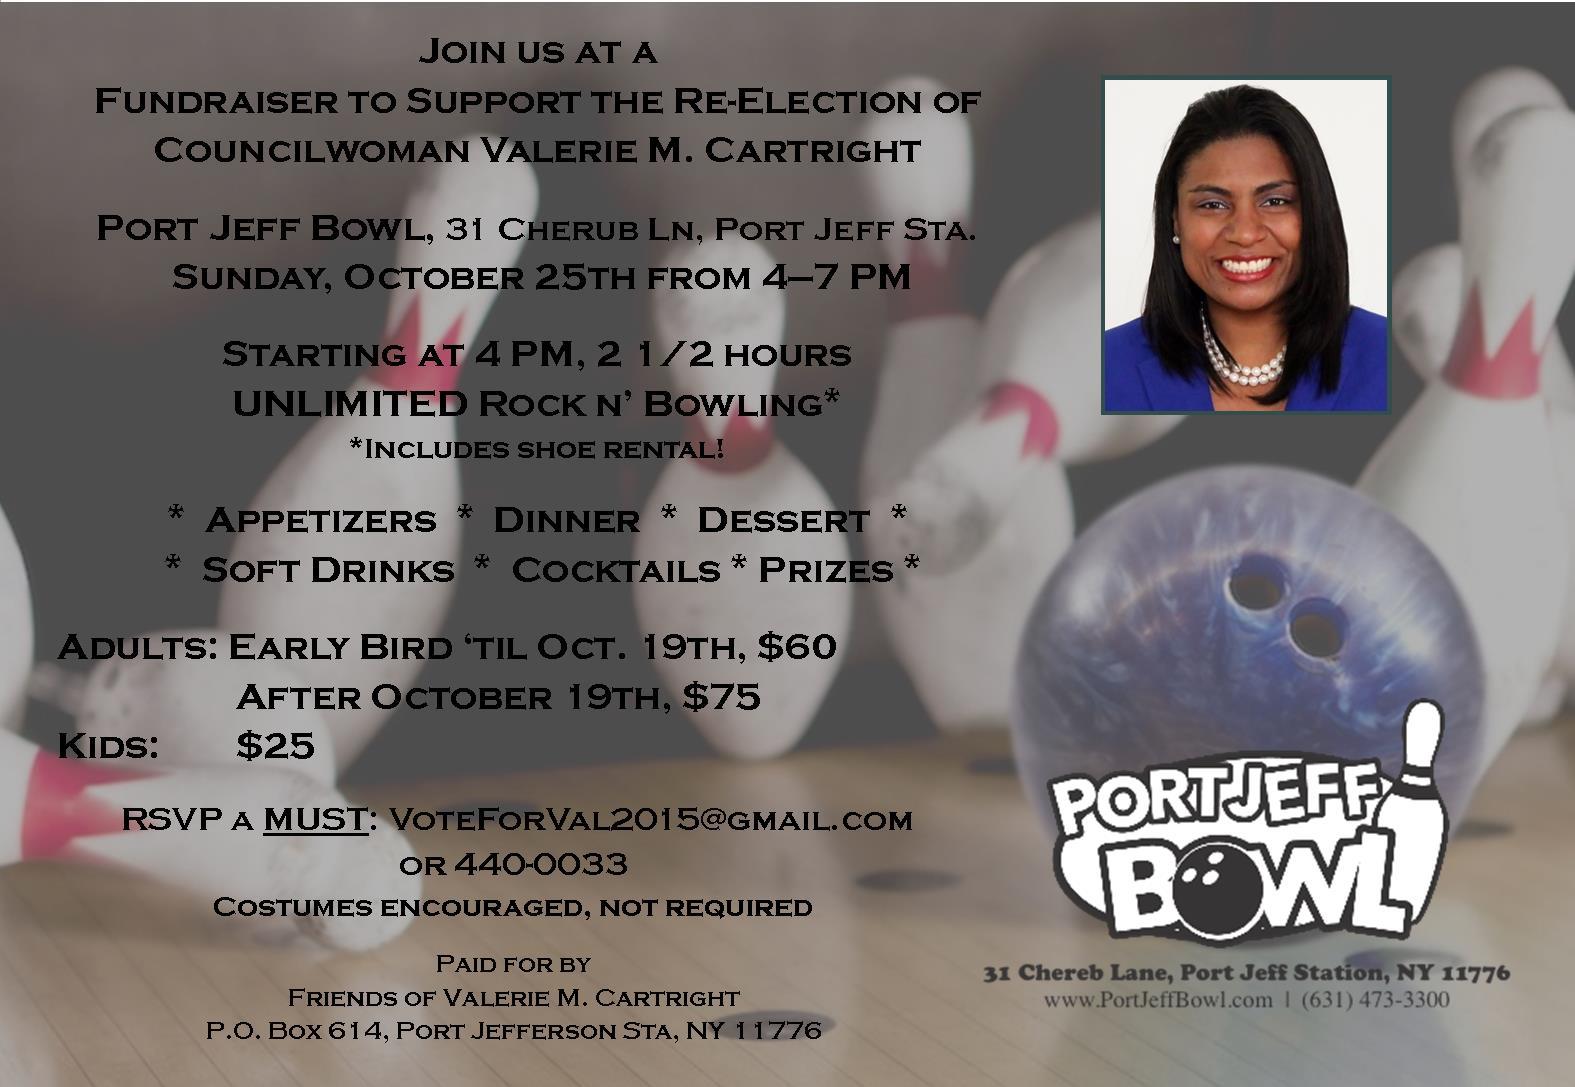 DRAFT_INVITE_PJ_Bowl_10-25-15_Fundraiser.jpg